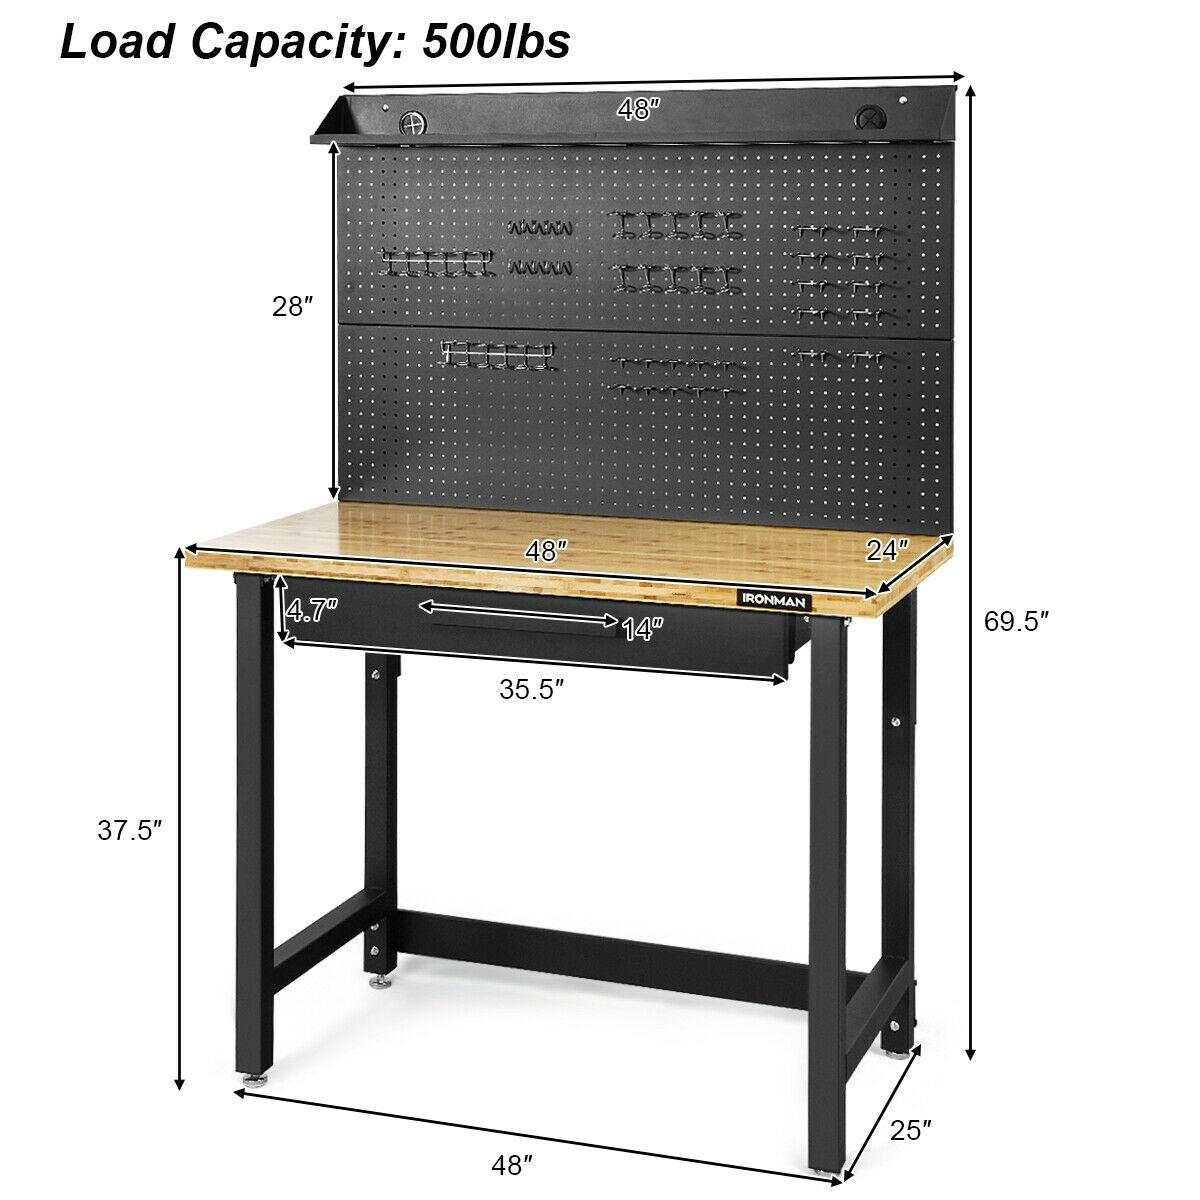 48 Inch Workcenter Bamboo Top Garage Workbench